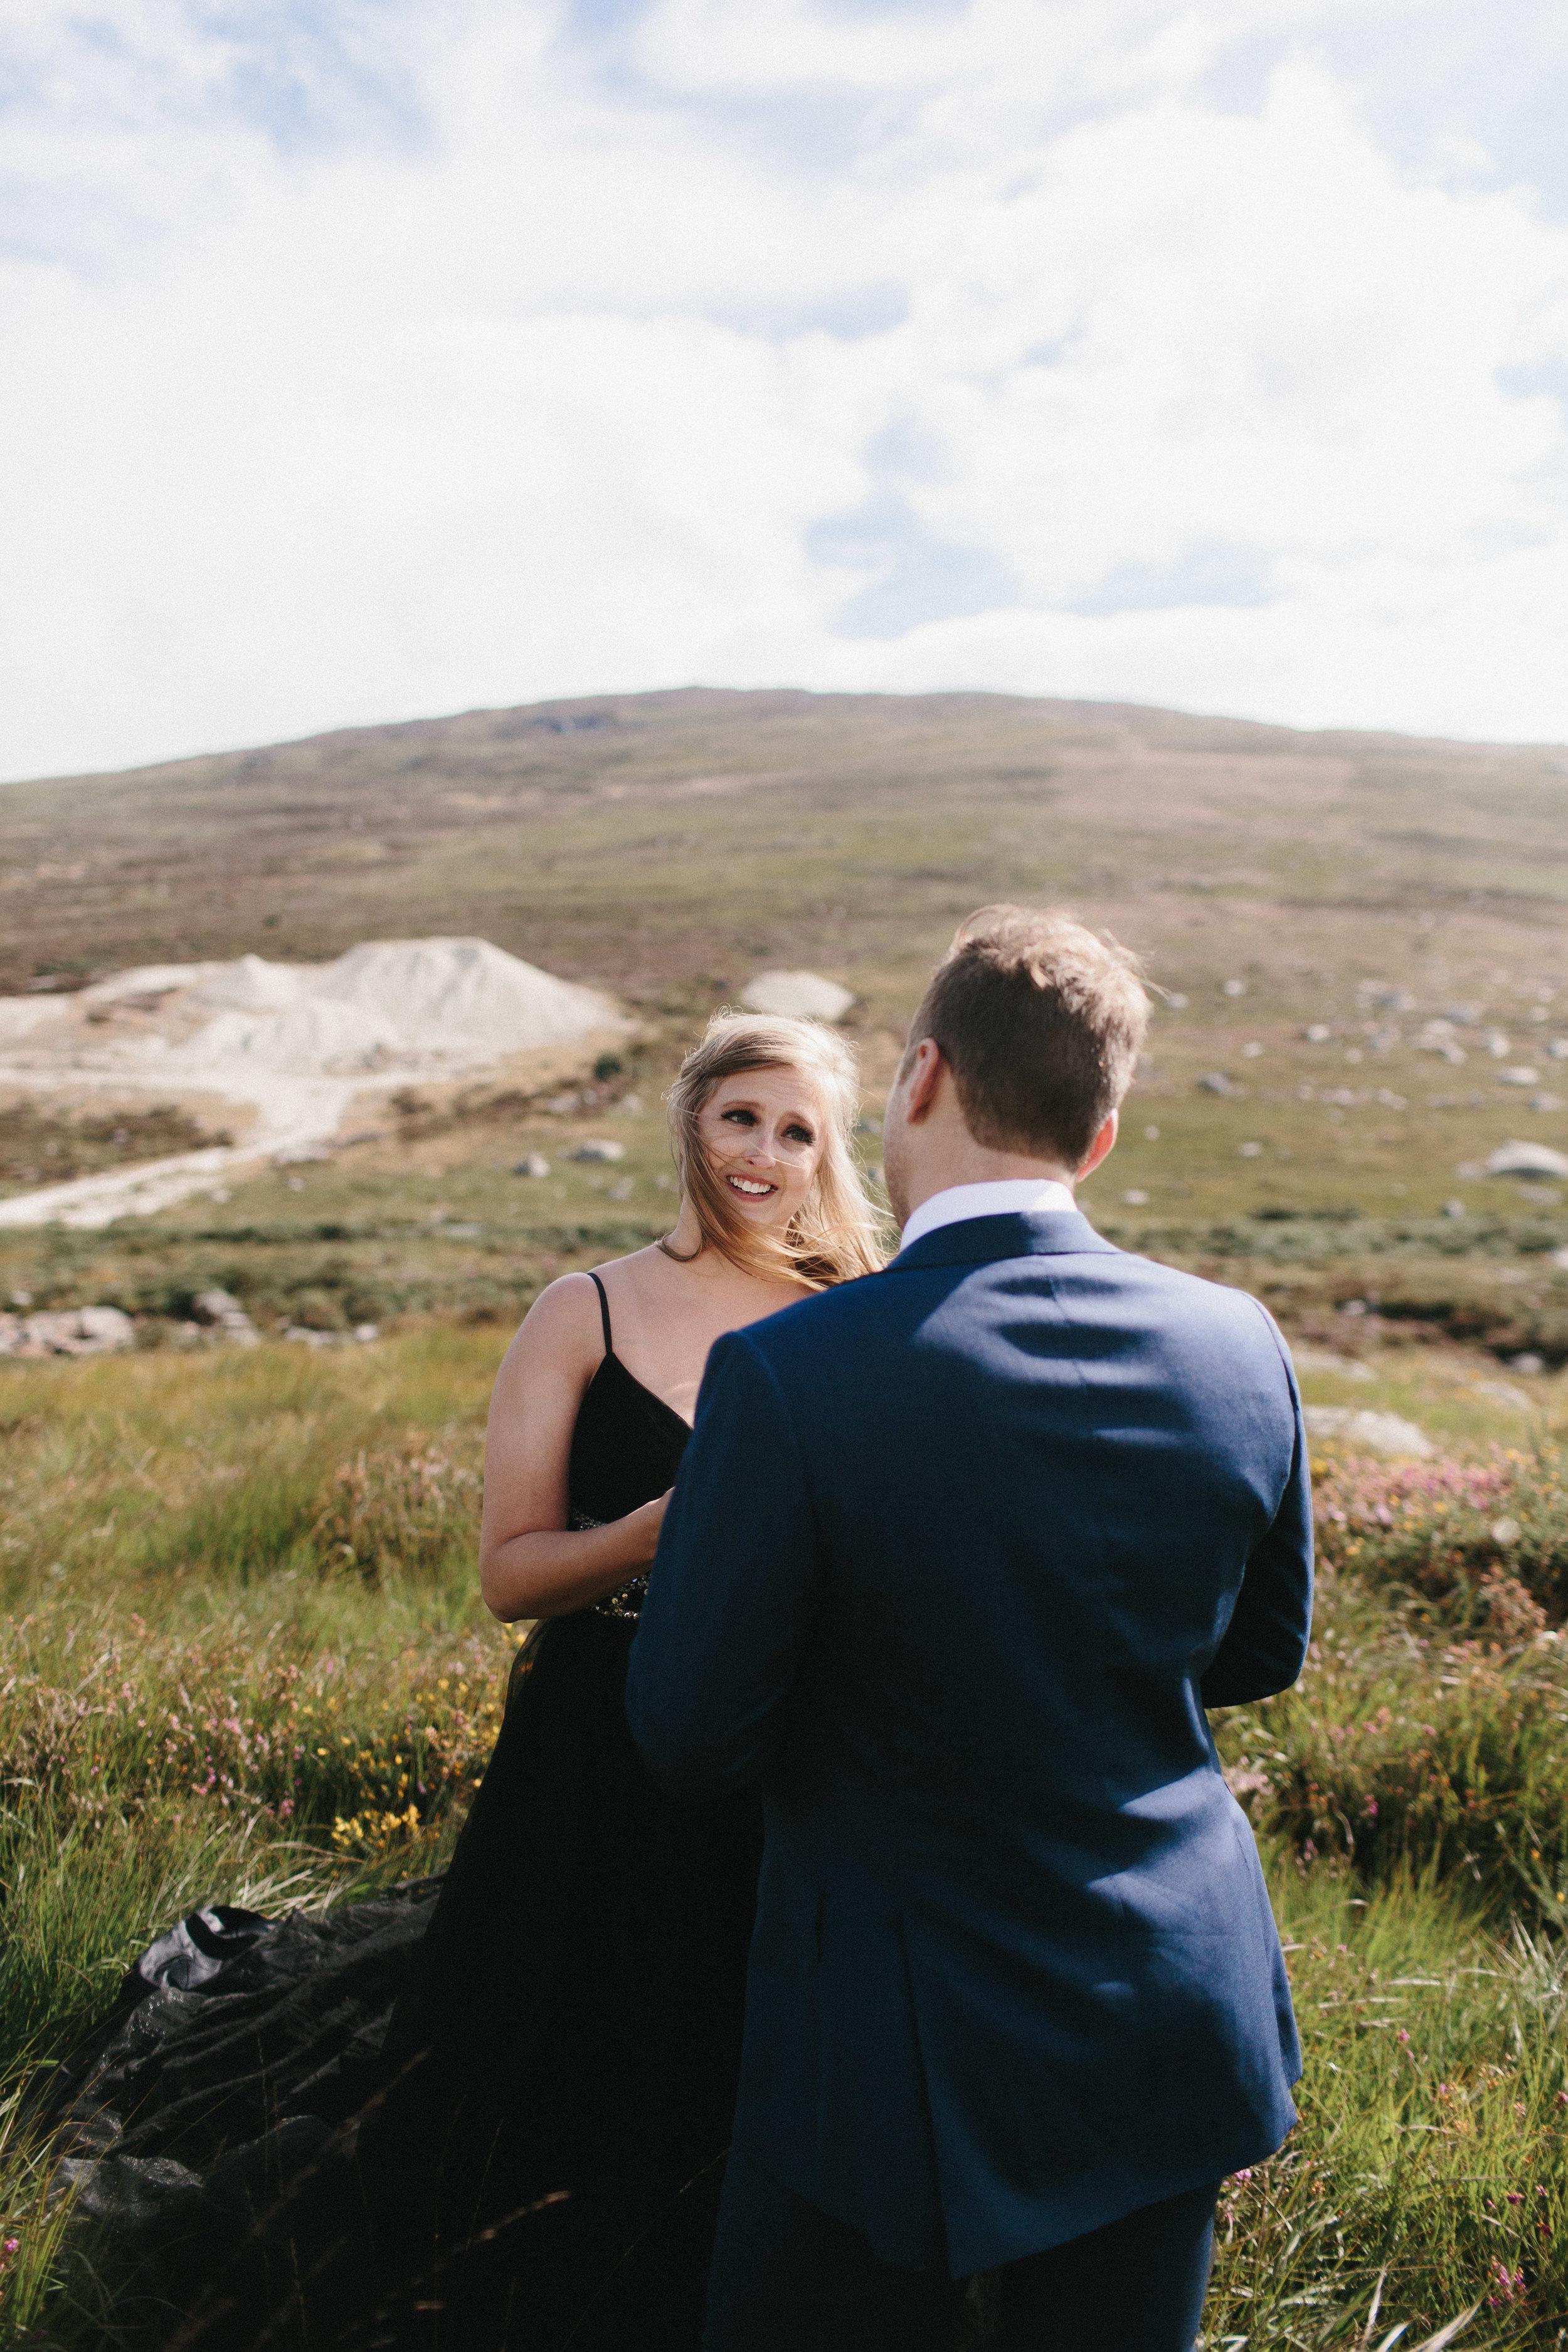 ireland_elopement_black_wedding_dress_wicklow_glendalough_athy_st_kevins_way_1180.jpg